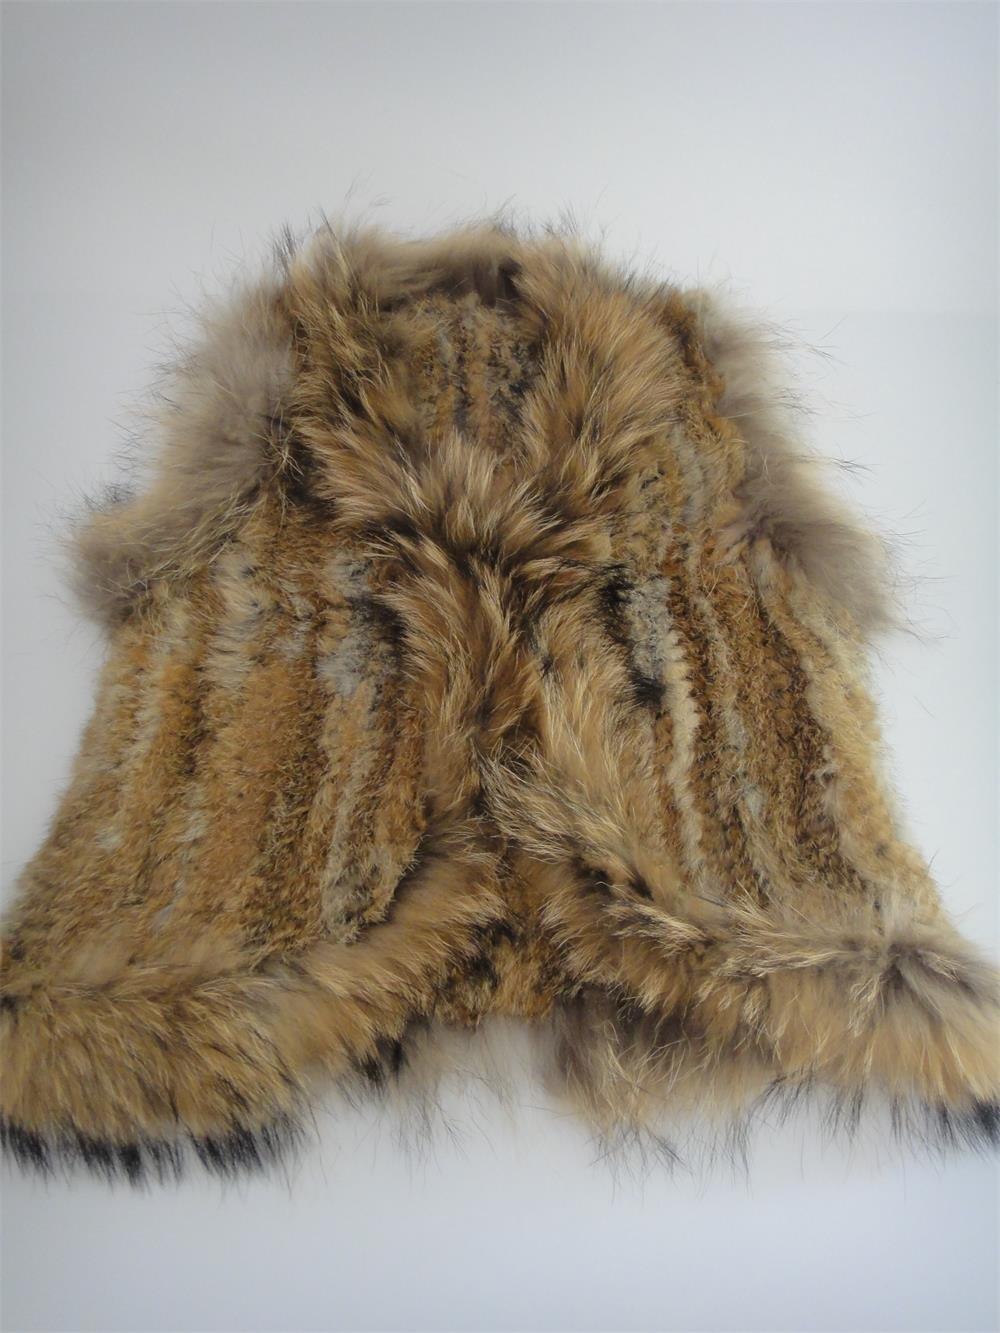 Rabbit Fur Vest With Raccoon Fur Trim Sleeveless